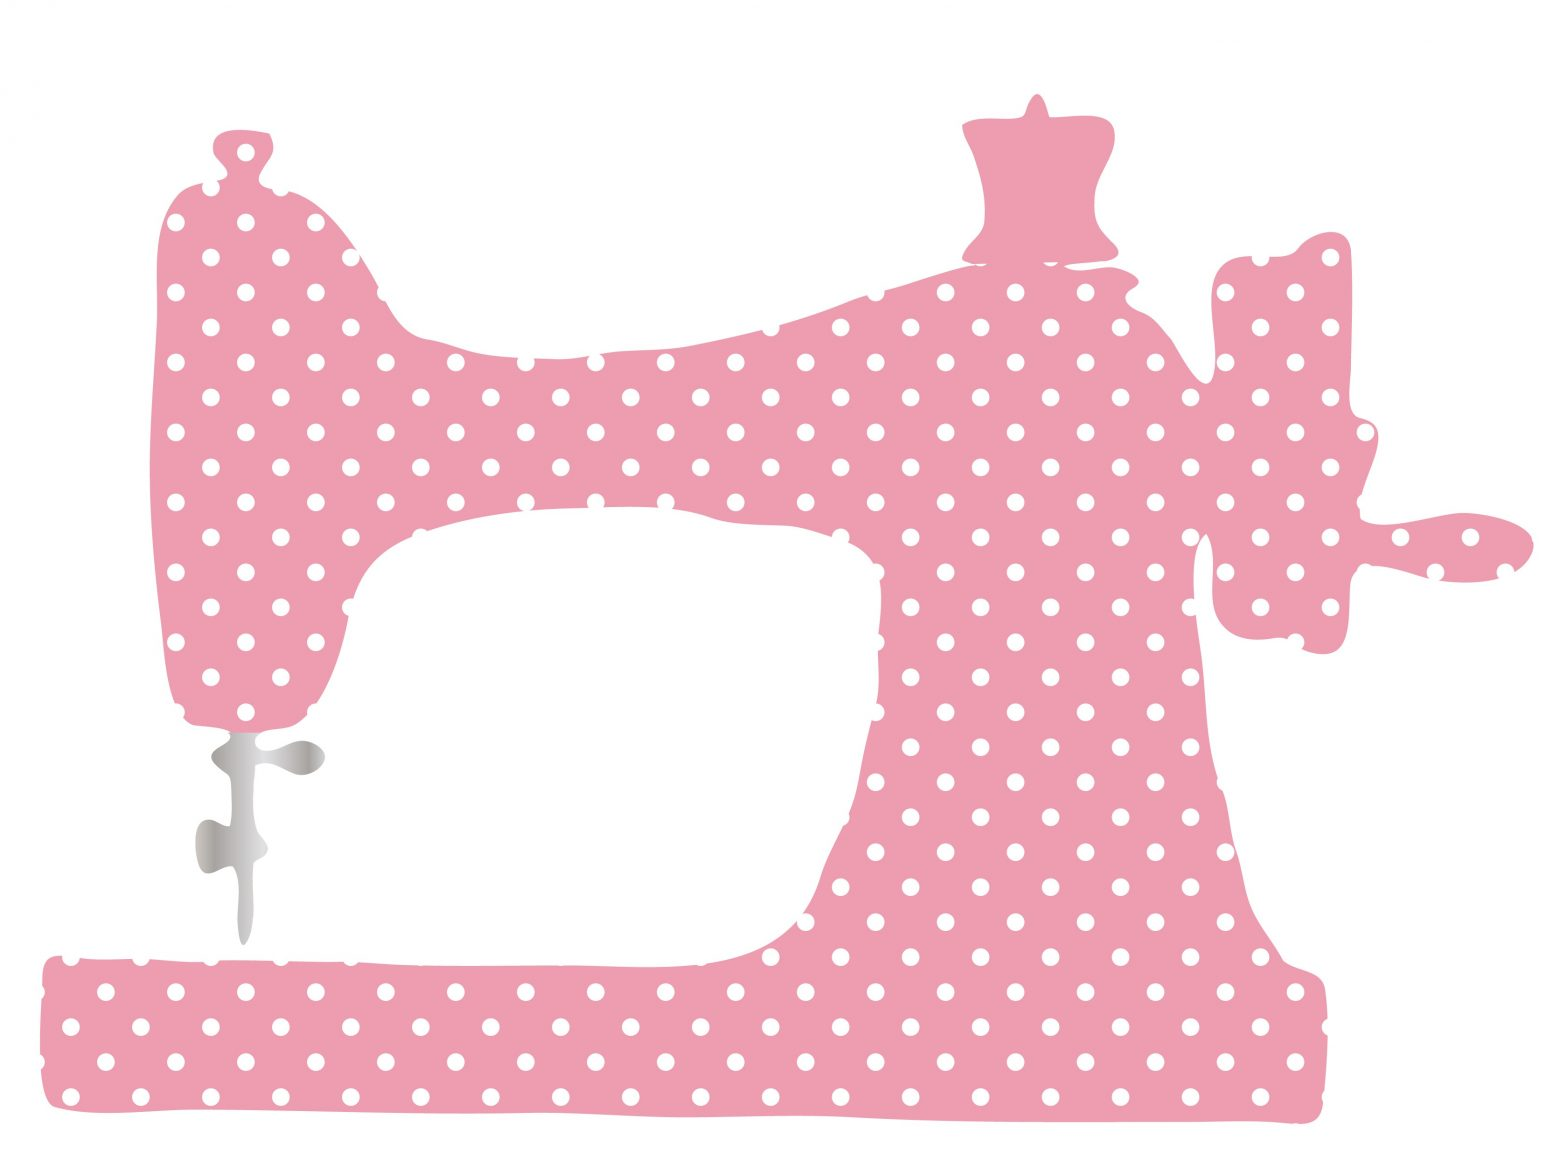 sewing-machine-898180